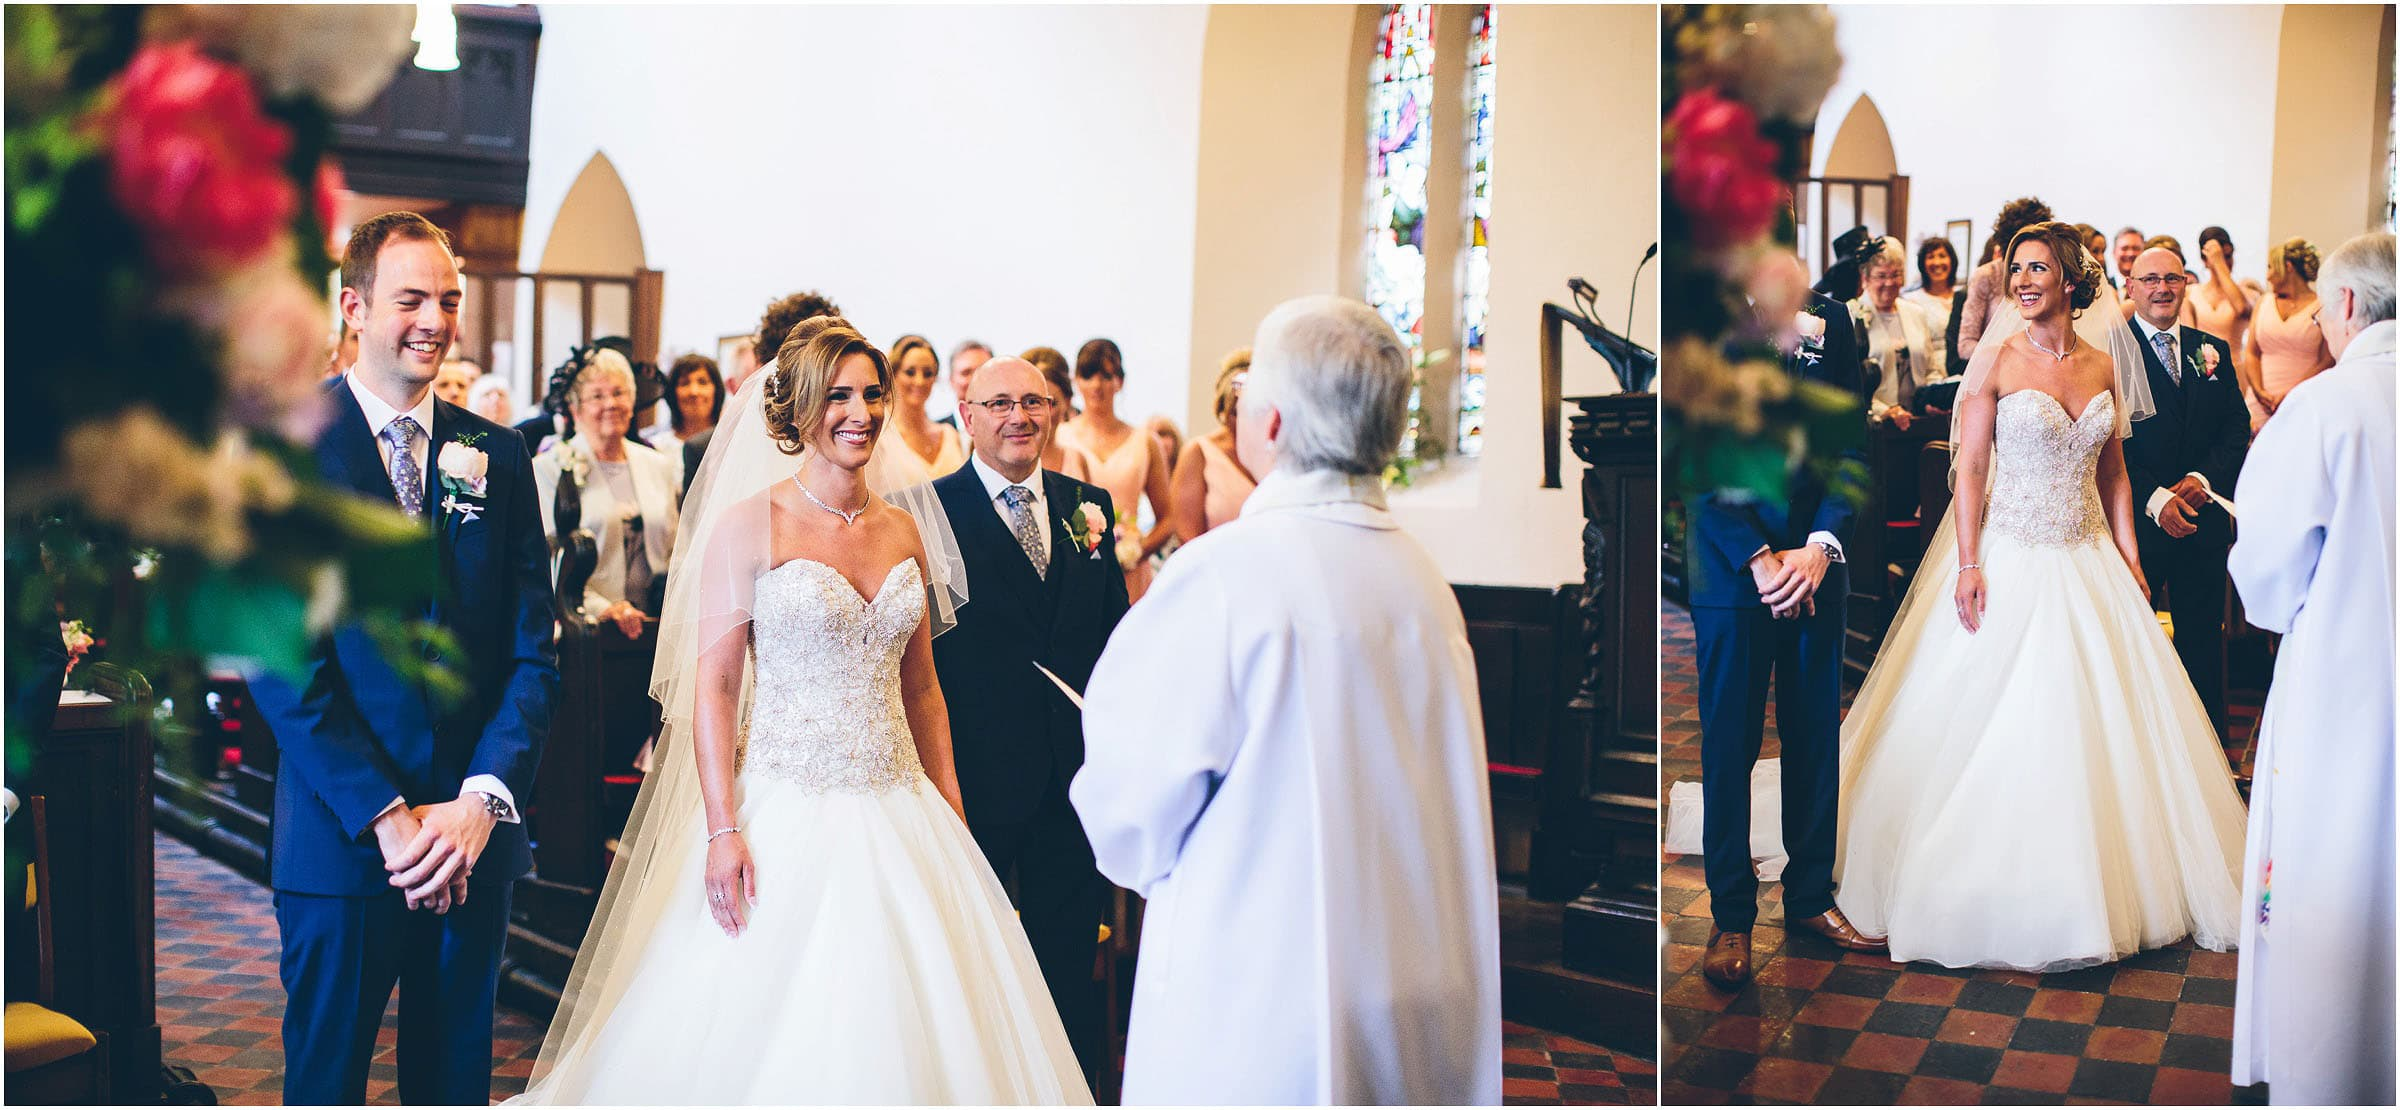 Mitton_Hall_Wedding_Photography_0044